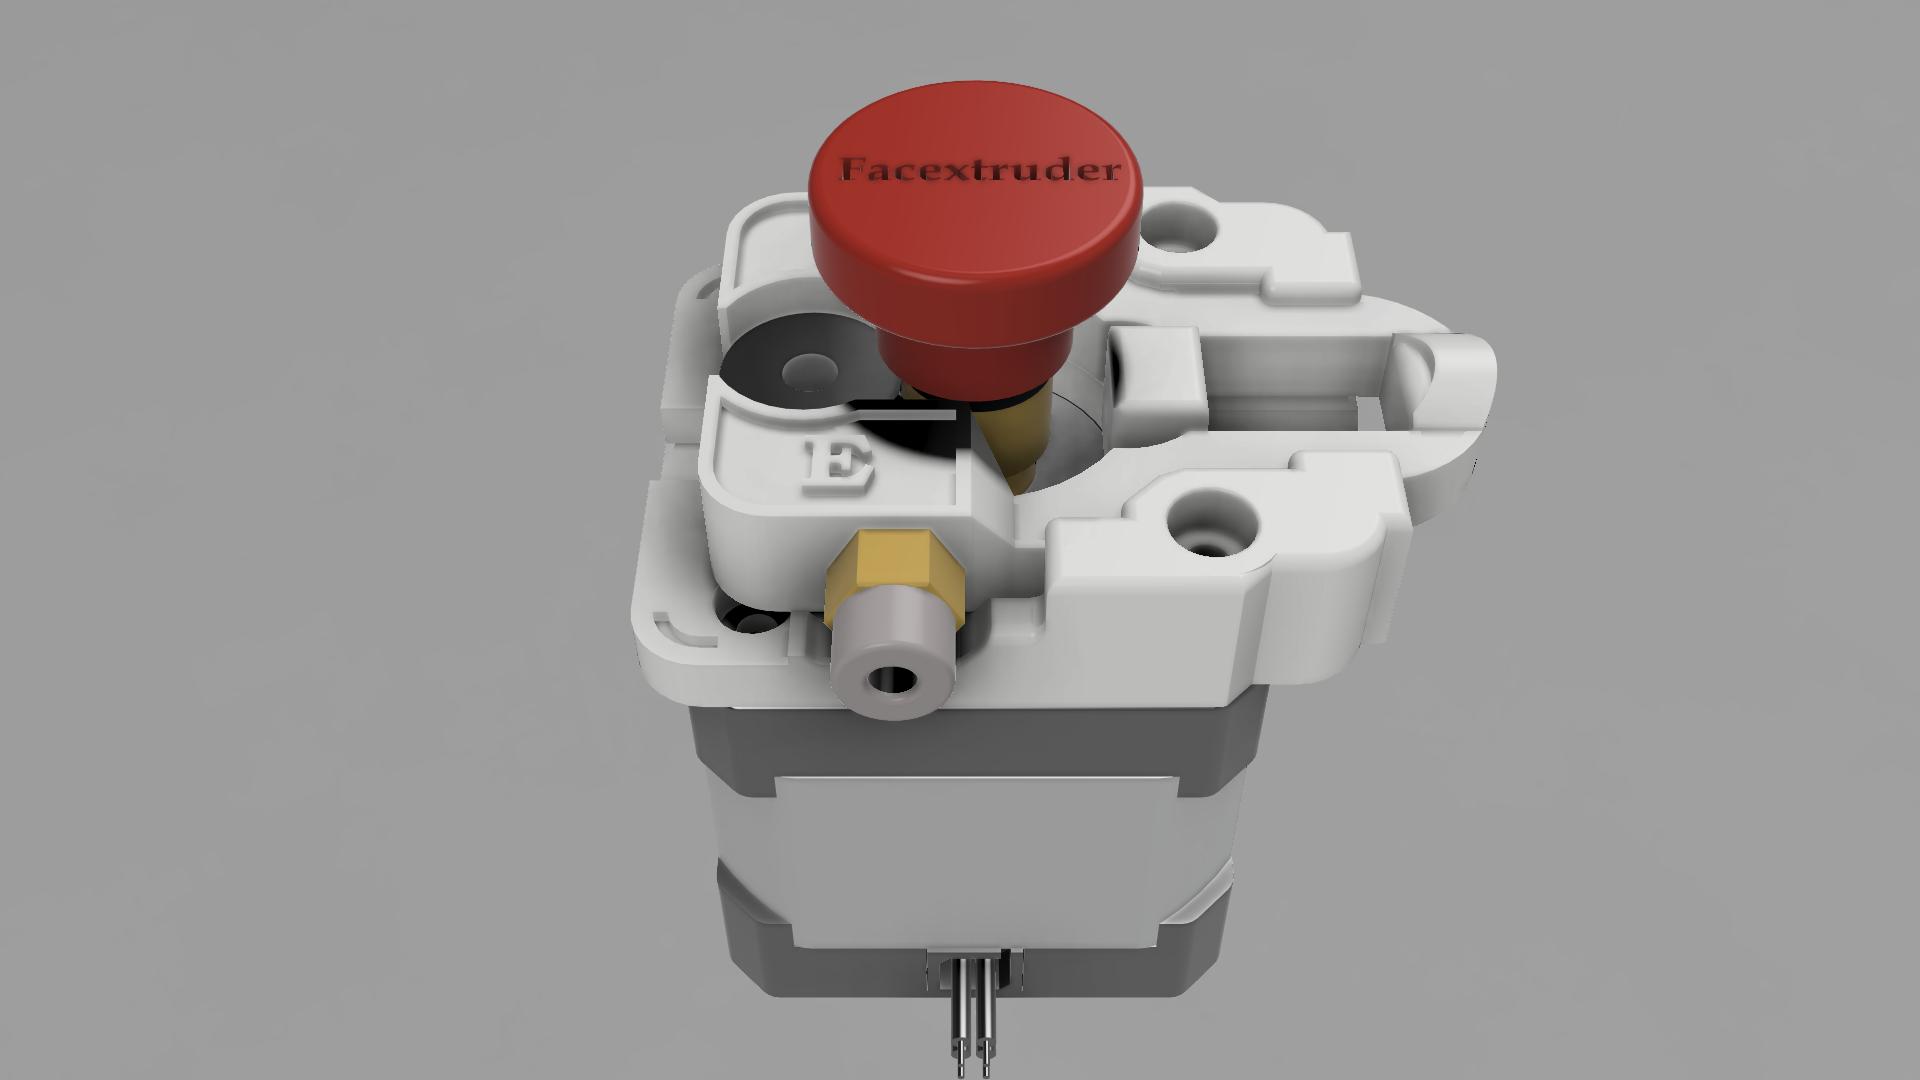 estr v2 v1.png Télécharger fichier STL Facextruder • Objet pour imprimante 3D, Print3d86